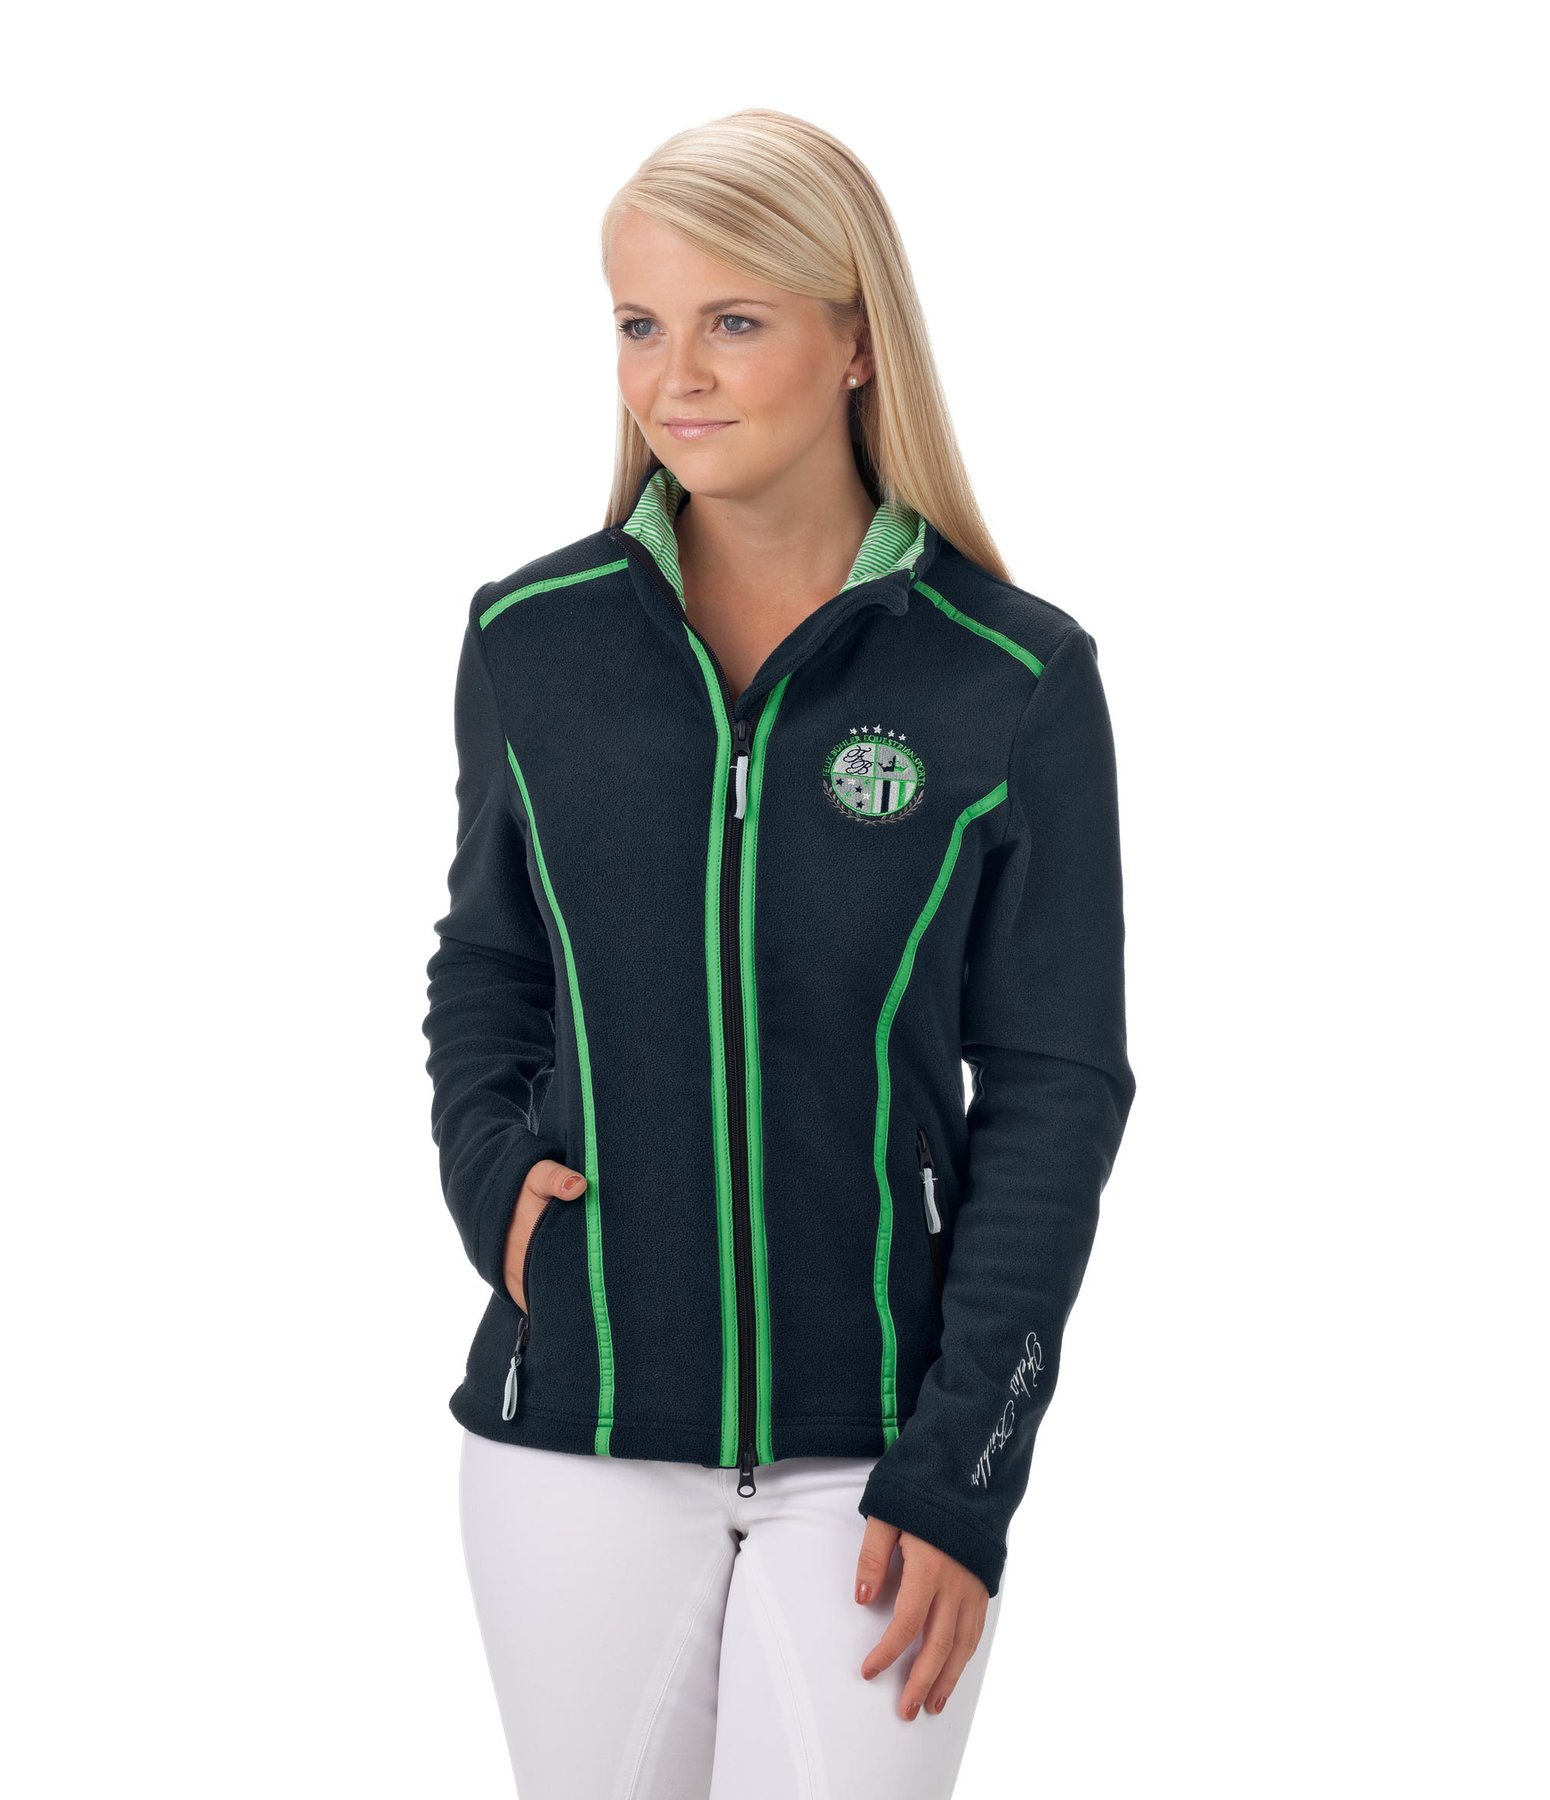 fleece jacket dana fleece jackets kramer equestrian. Black Bedroom Furniture Sets. Home Design Ideas